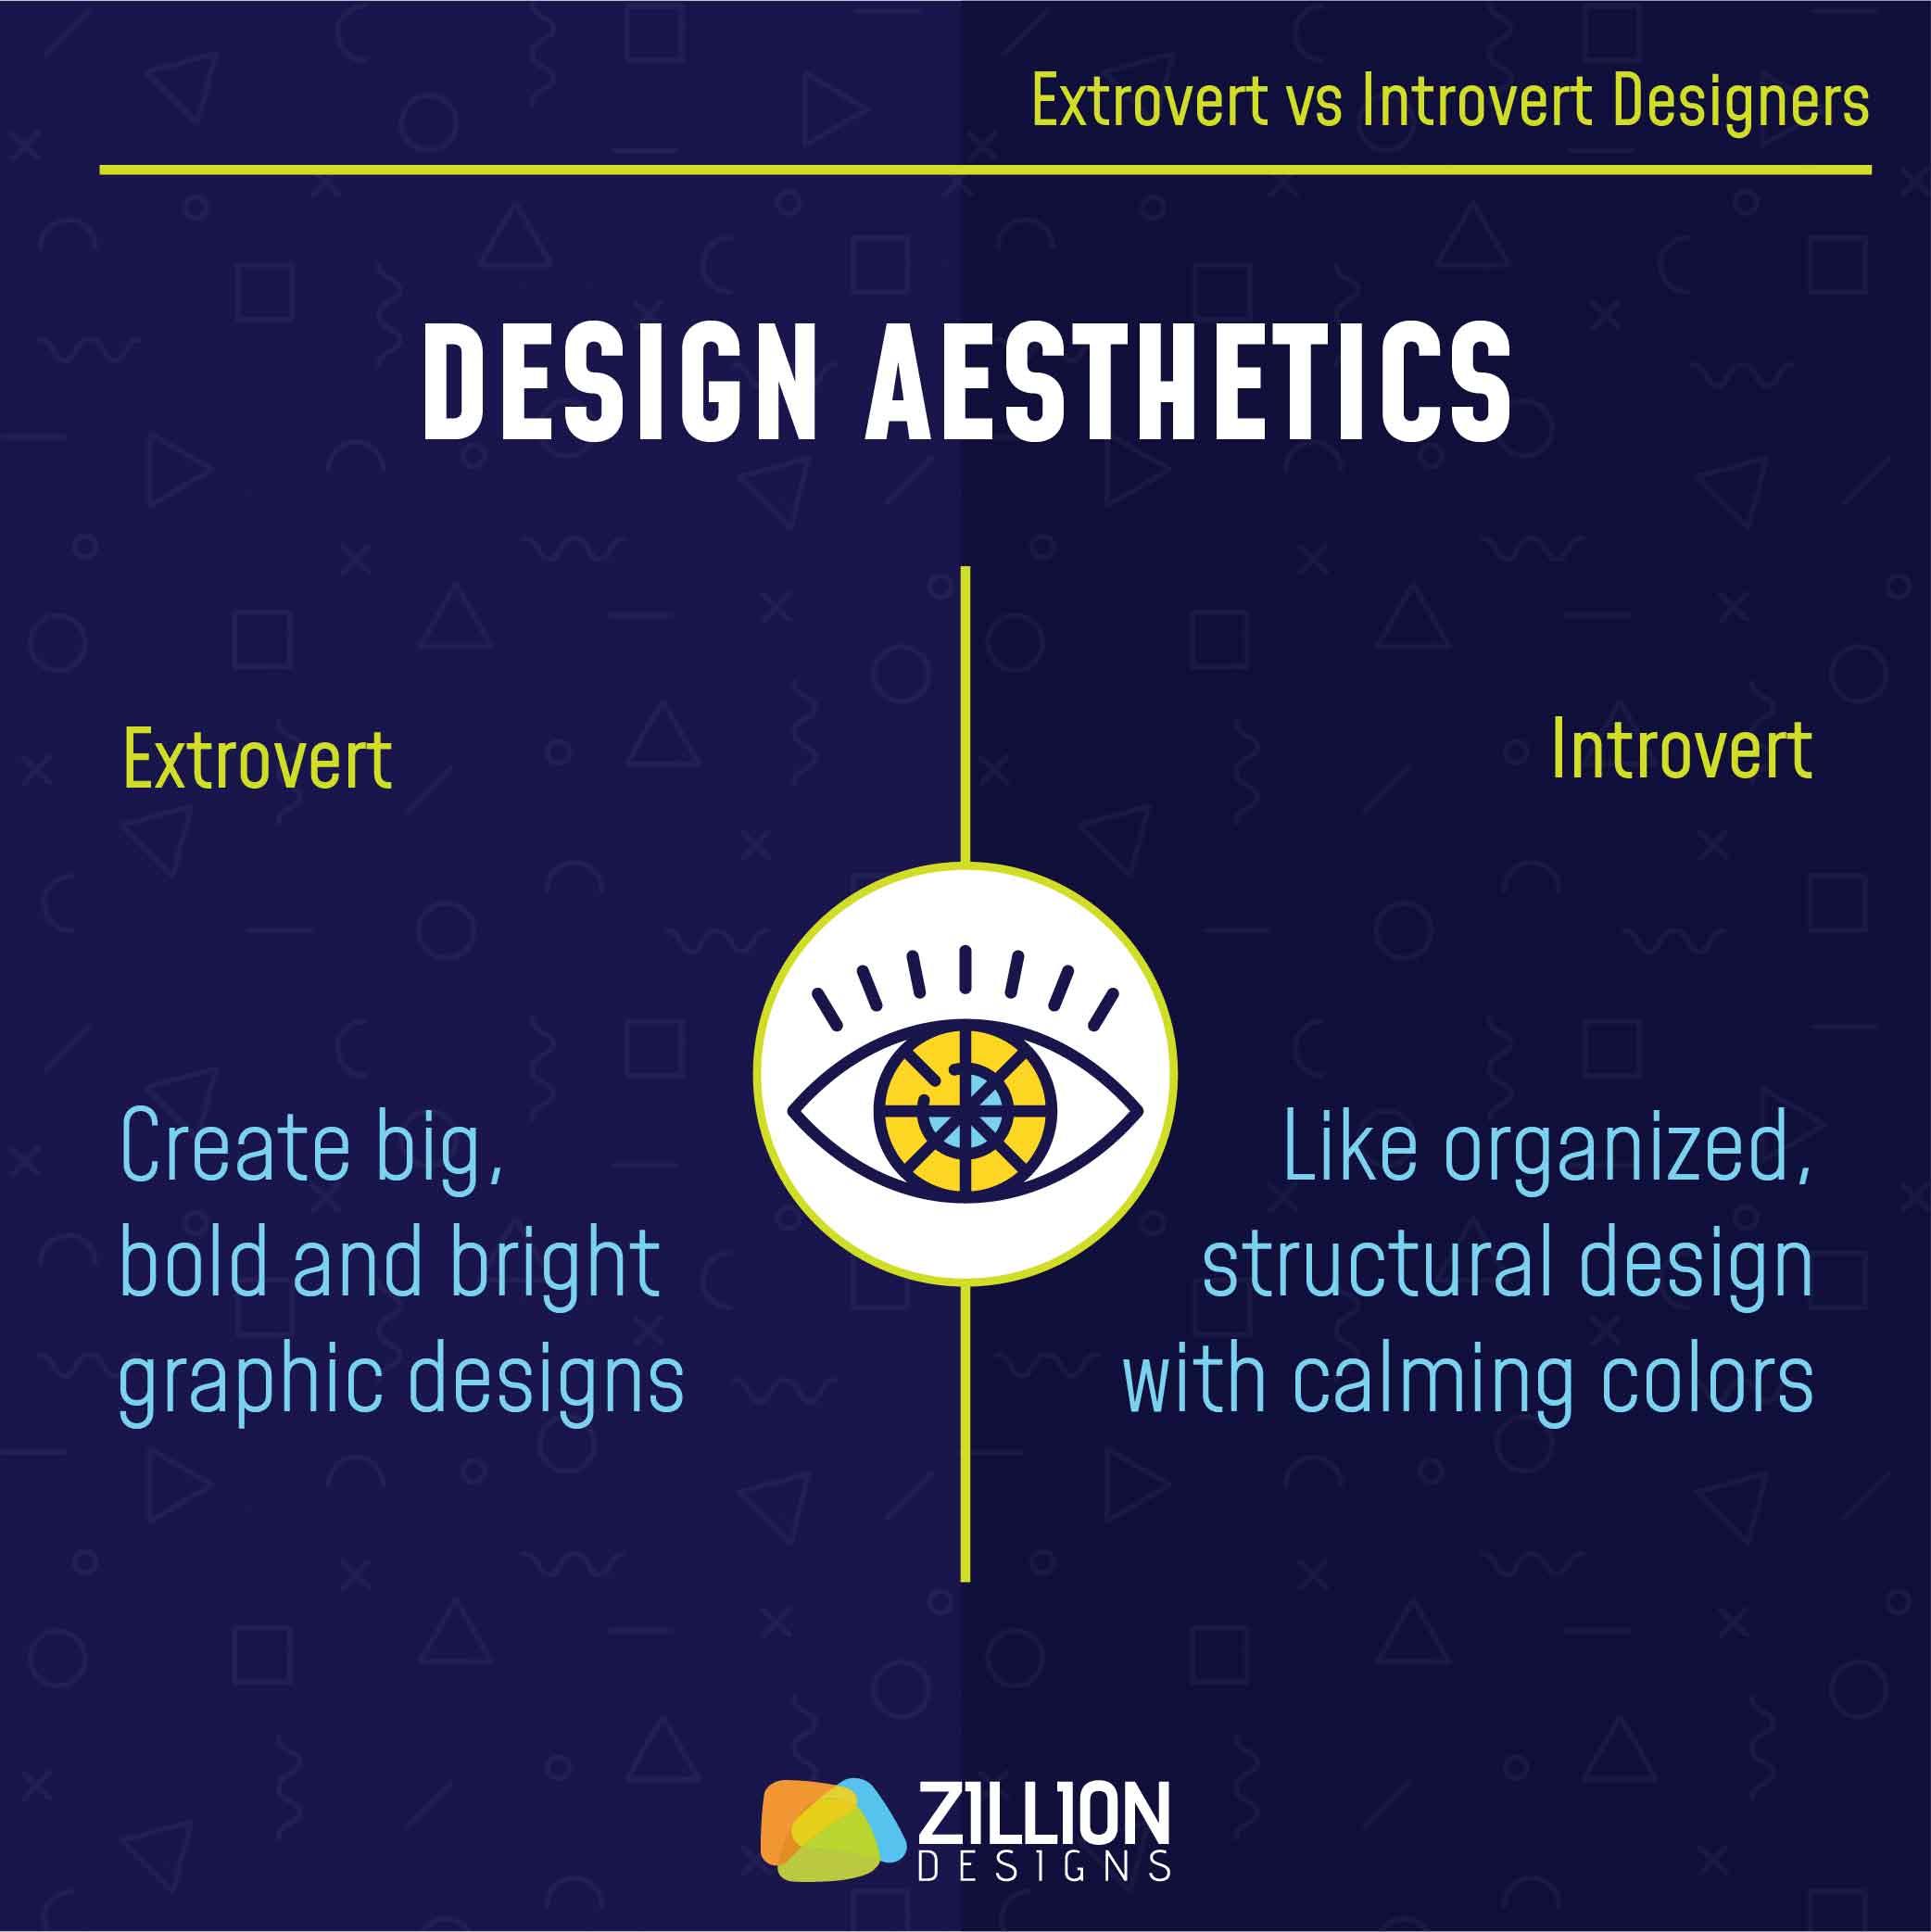 Extrovert vs Introvert Designers 11